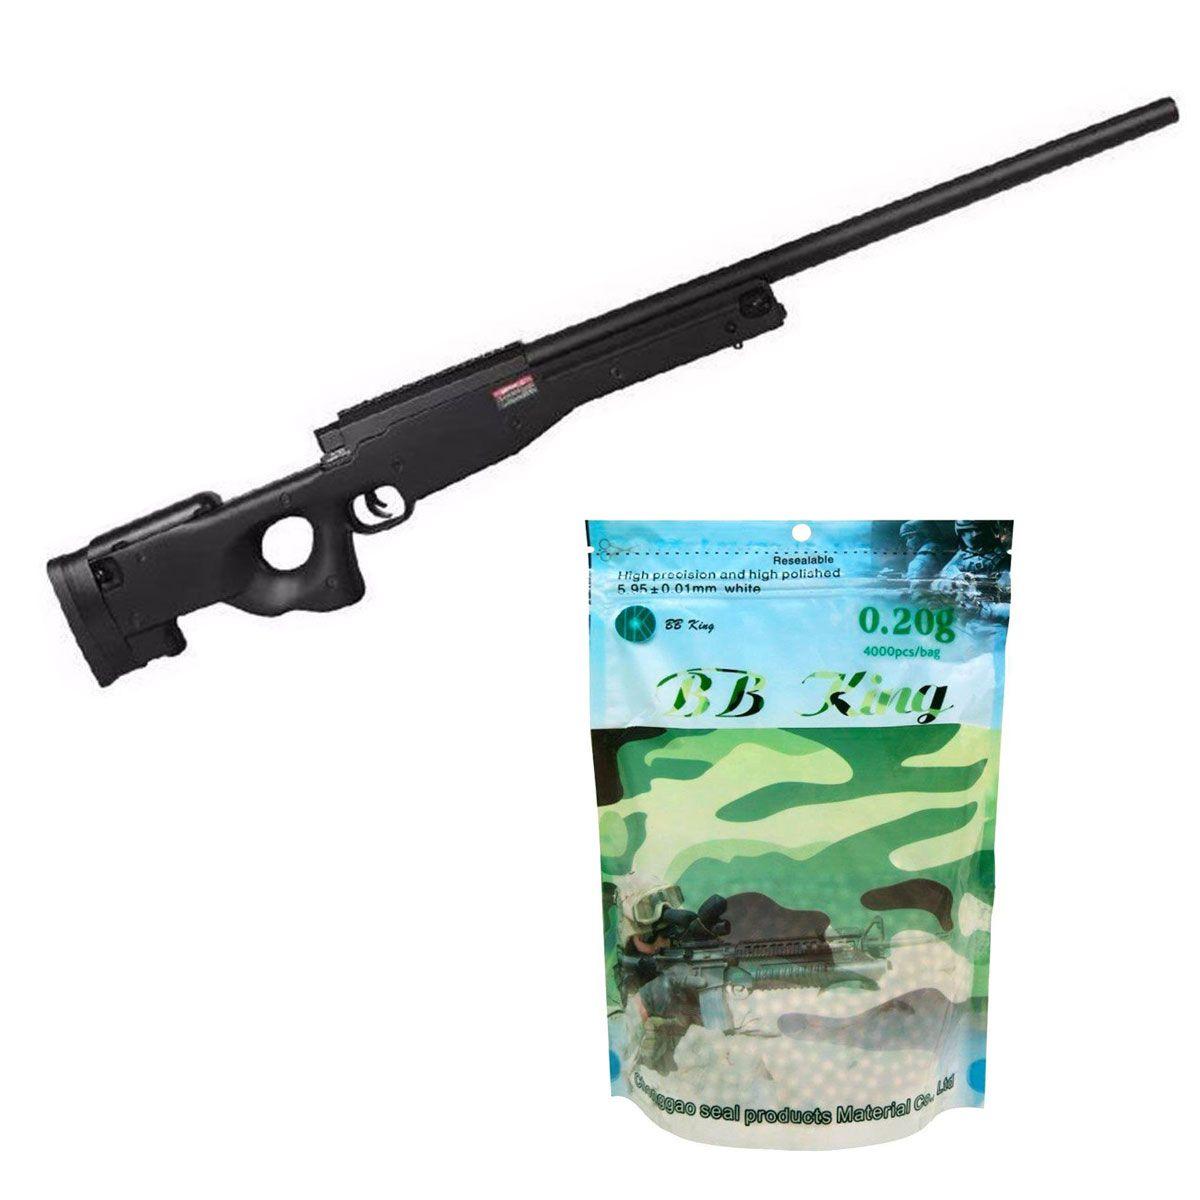 Kit Sniper Evo L96 Preto + BB King 0,20g